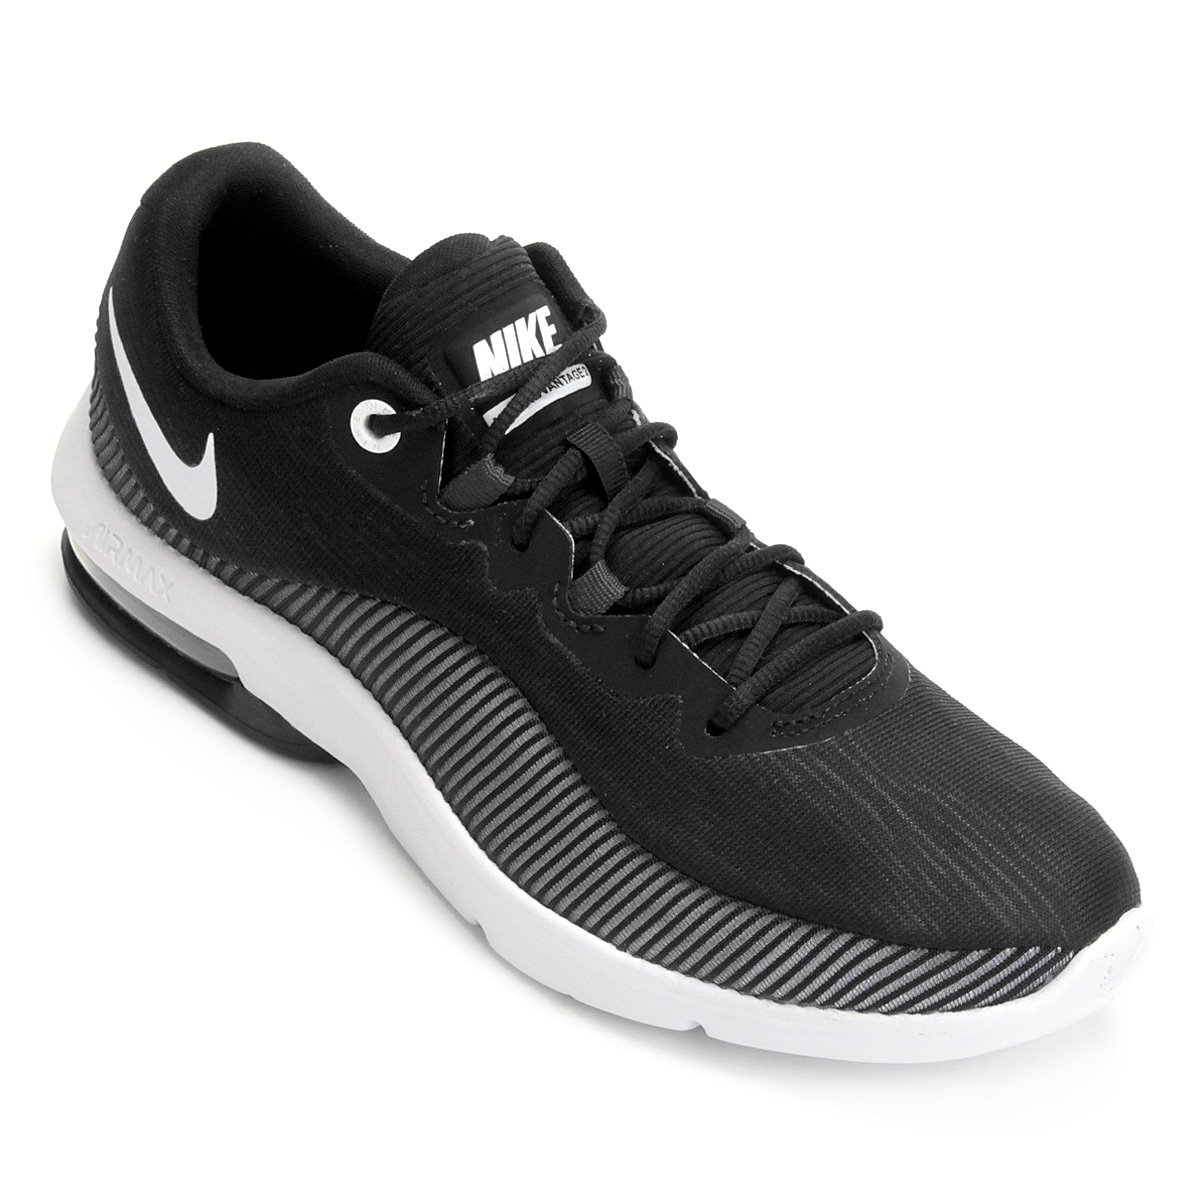 Tênis Nike Air Max Advantage 2 Feminino - Preto e Branco - Compre ... 81eec19aea